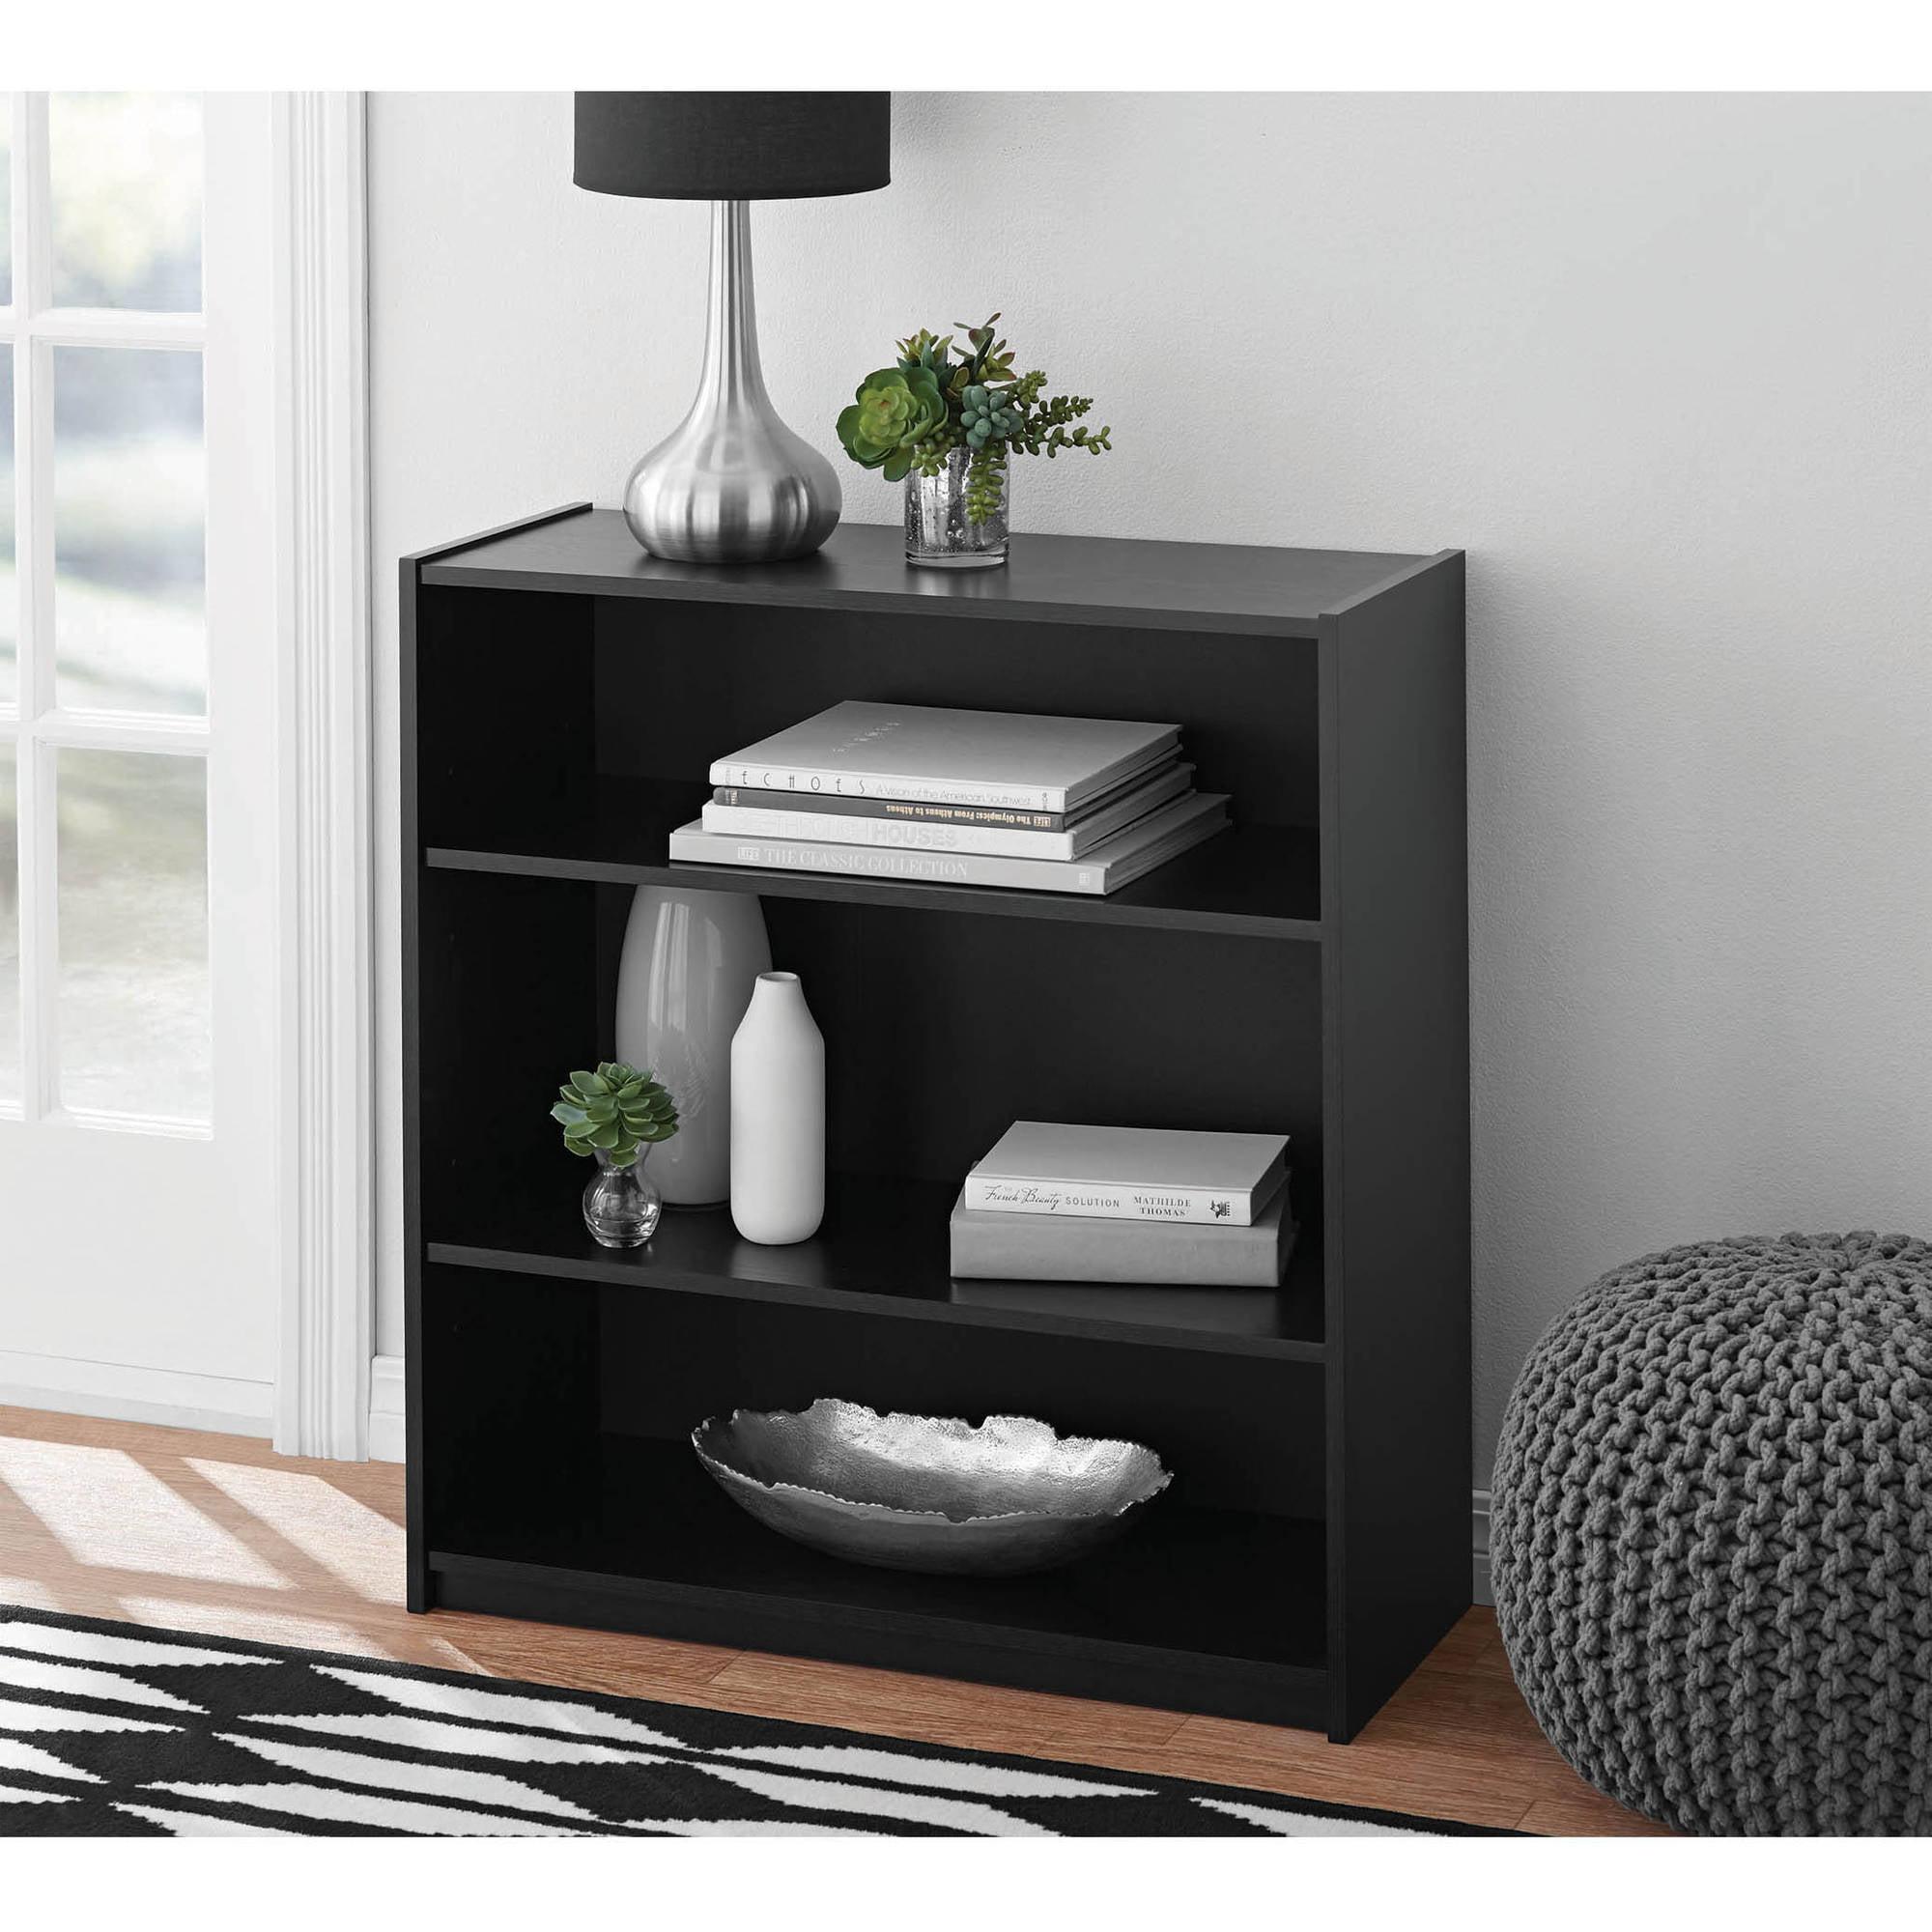 Mainstays 3Shelf Bookcase Multiple Colors Walmart – Mainstays 3 Shelf Bookcase